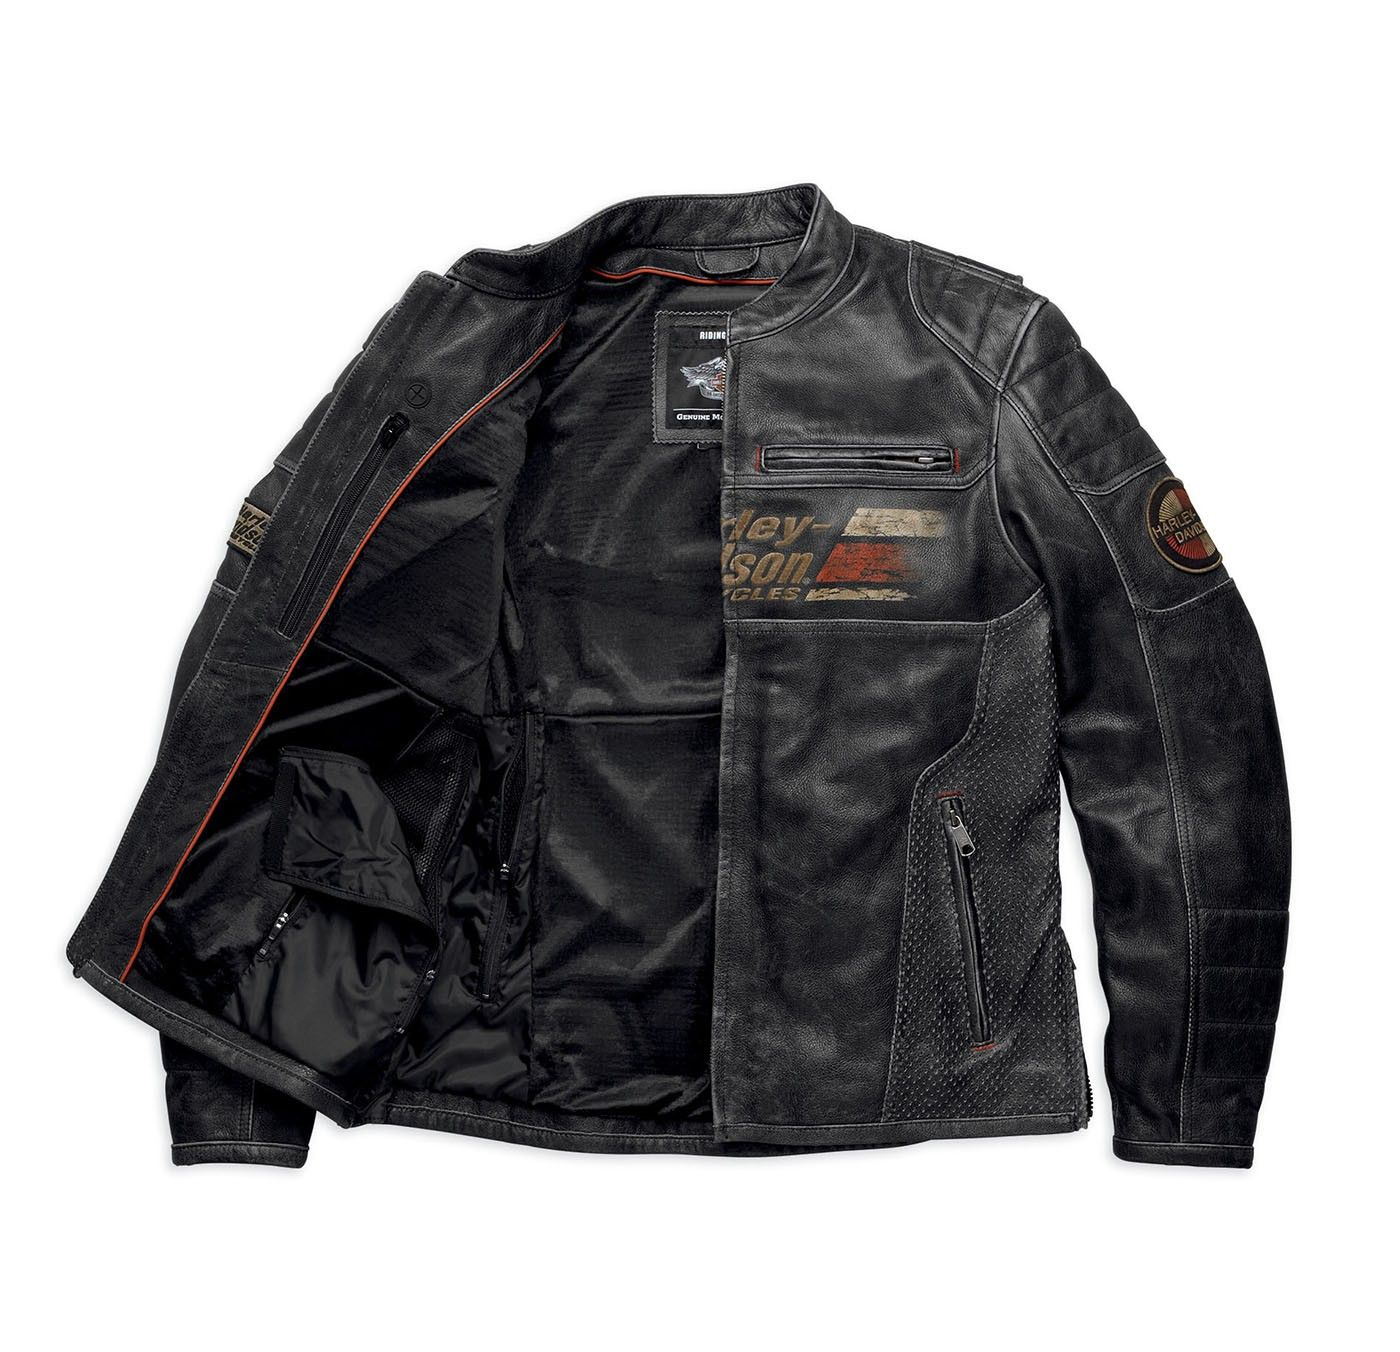 Buy Professional Motorcycle Biker Leather Jacket For Men S In Usa Leather Jacket Men Distressed Leather Jacket Leather Jacket [ 1352 x 1400 Pixel ]